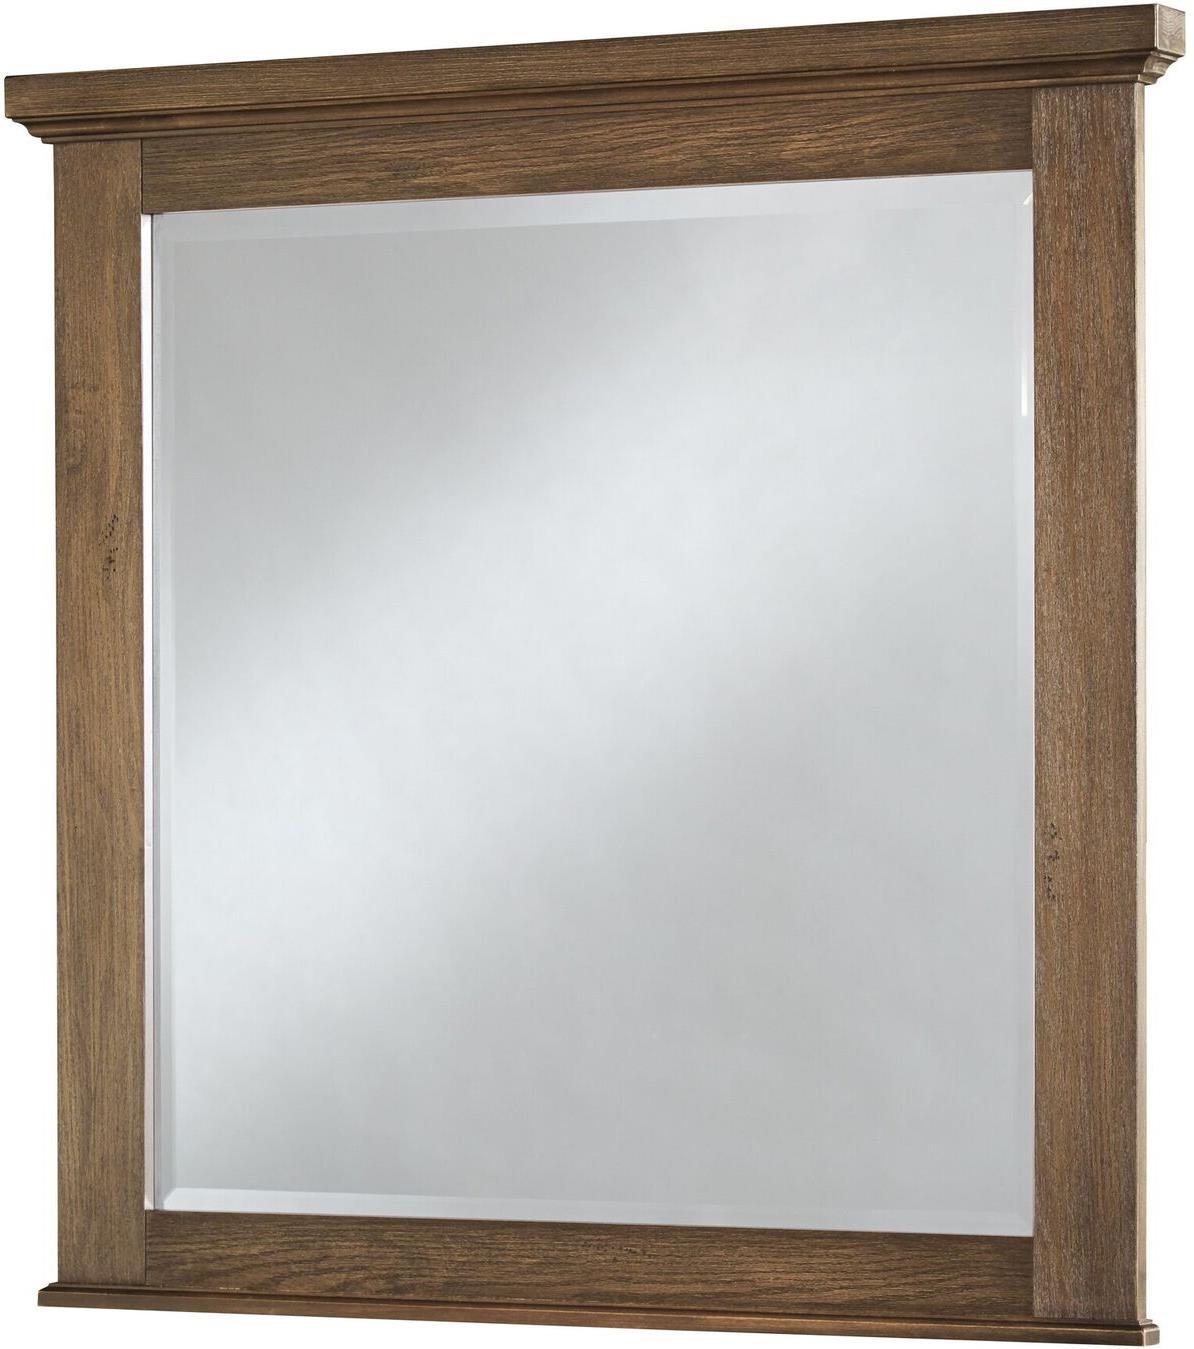 Vaughan Bassett Cassell Park Landscape Mirror - Item Number: 514-446